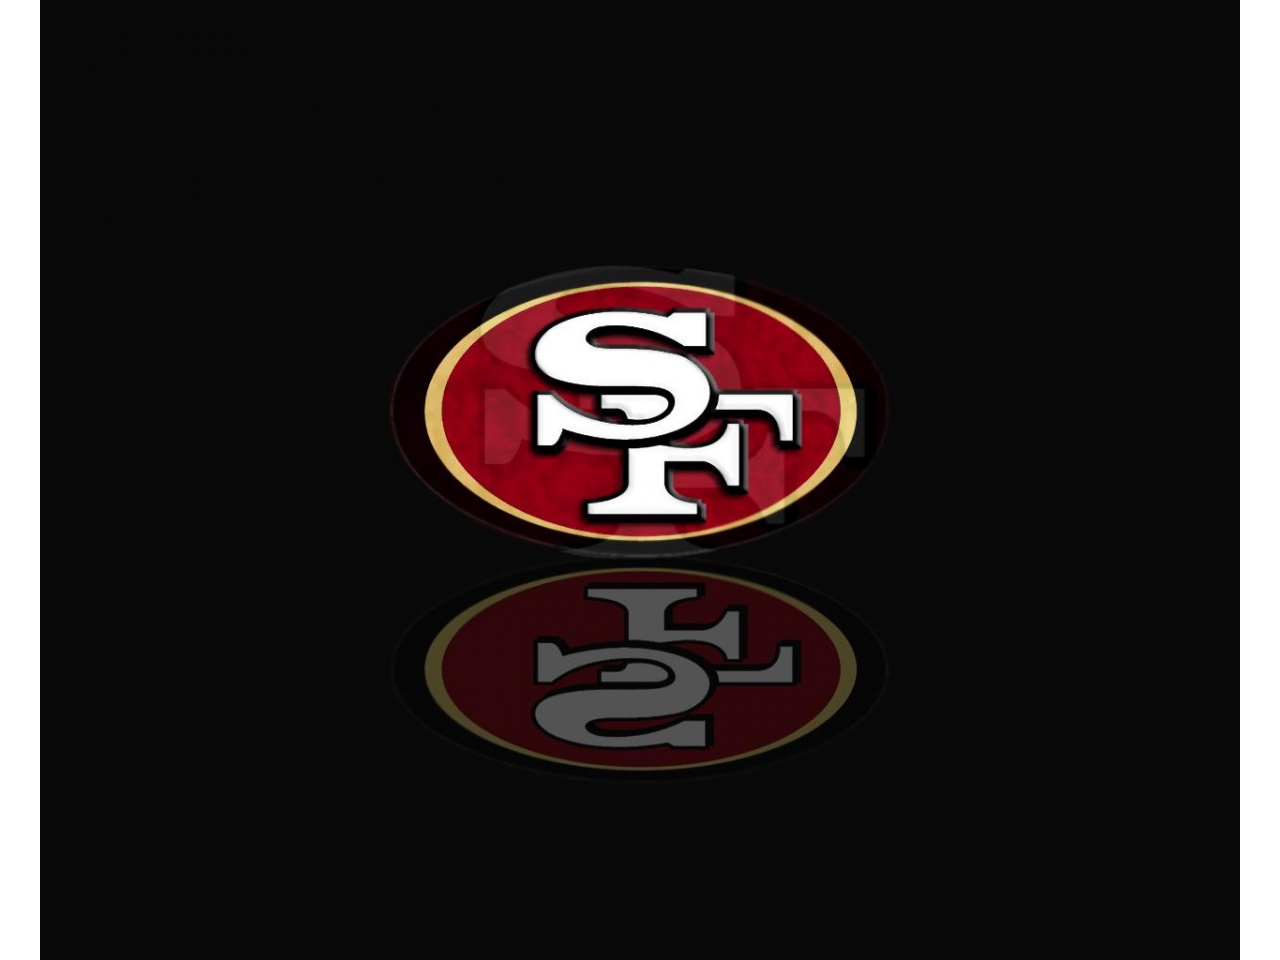 San Francisco 49ers wallpaper desktop background San Francisco 49ers 1280x960